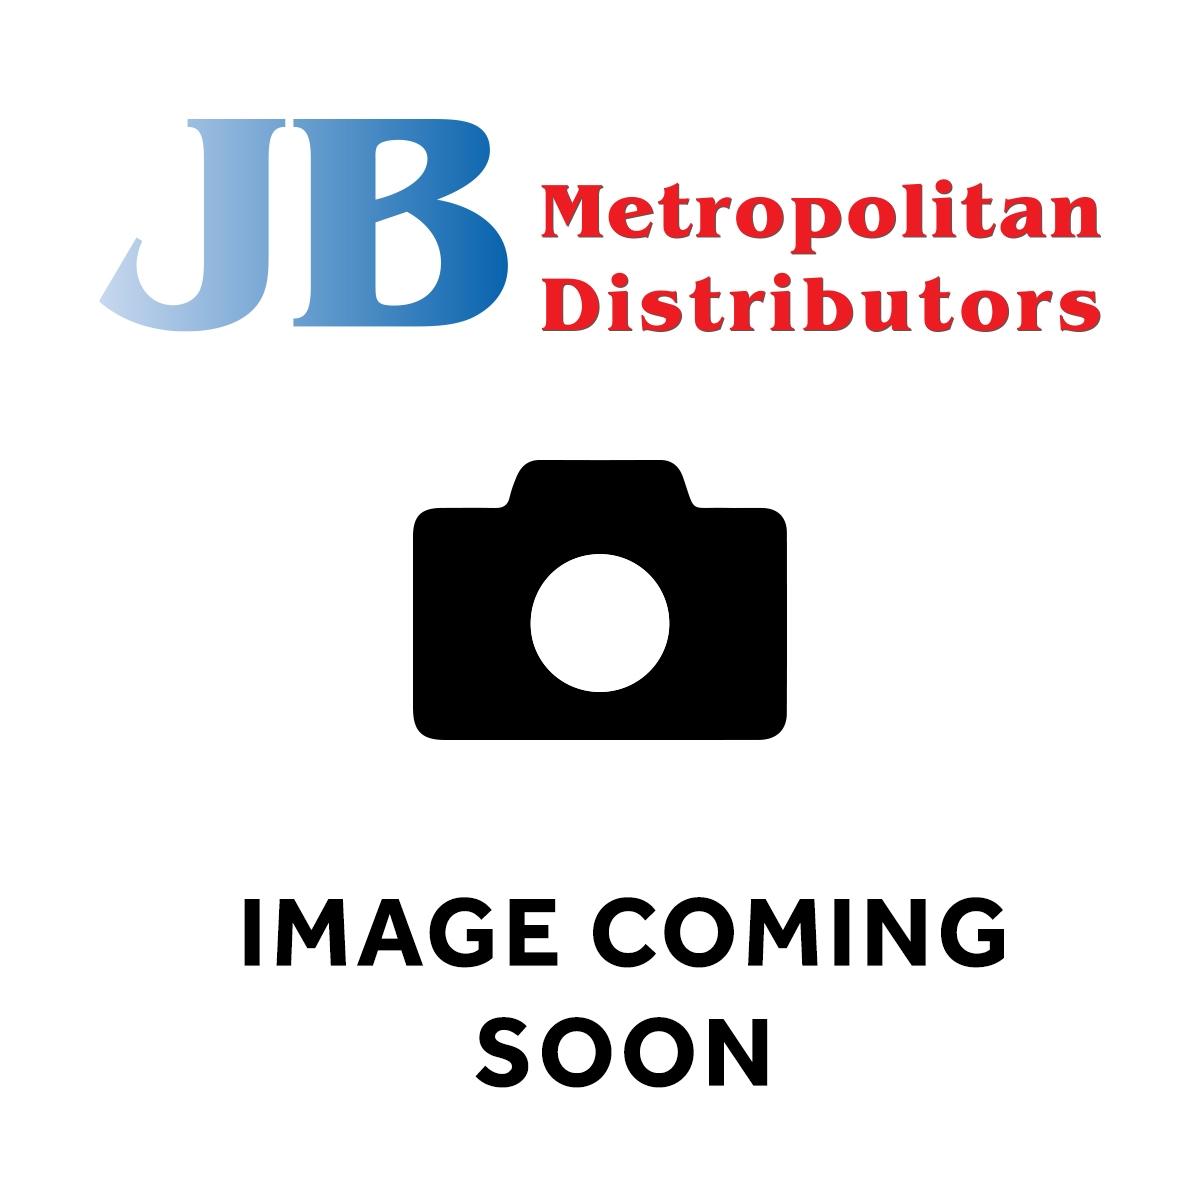 EXTRA WHITE BUBBLEMINT 10 PIECE